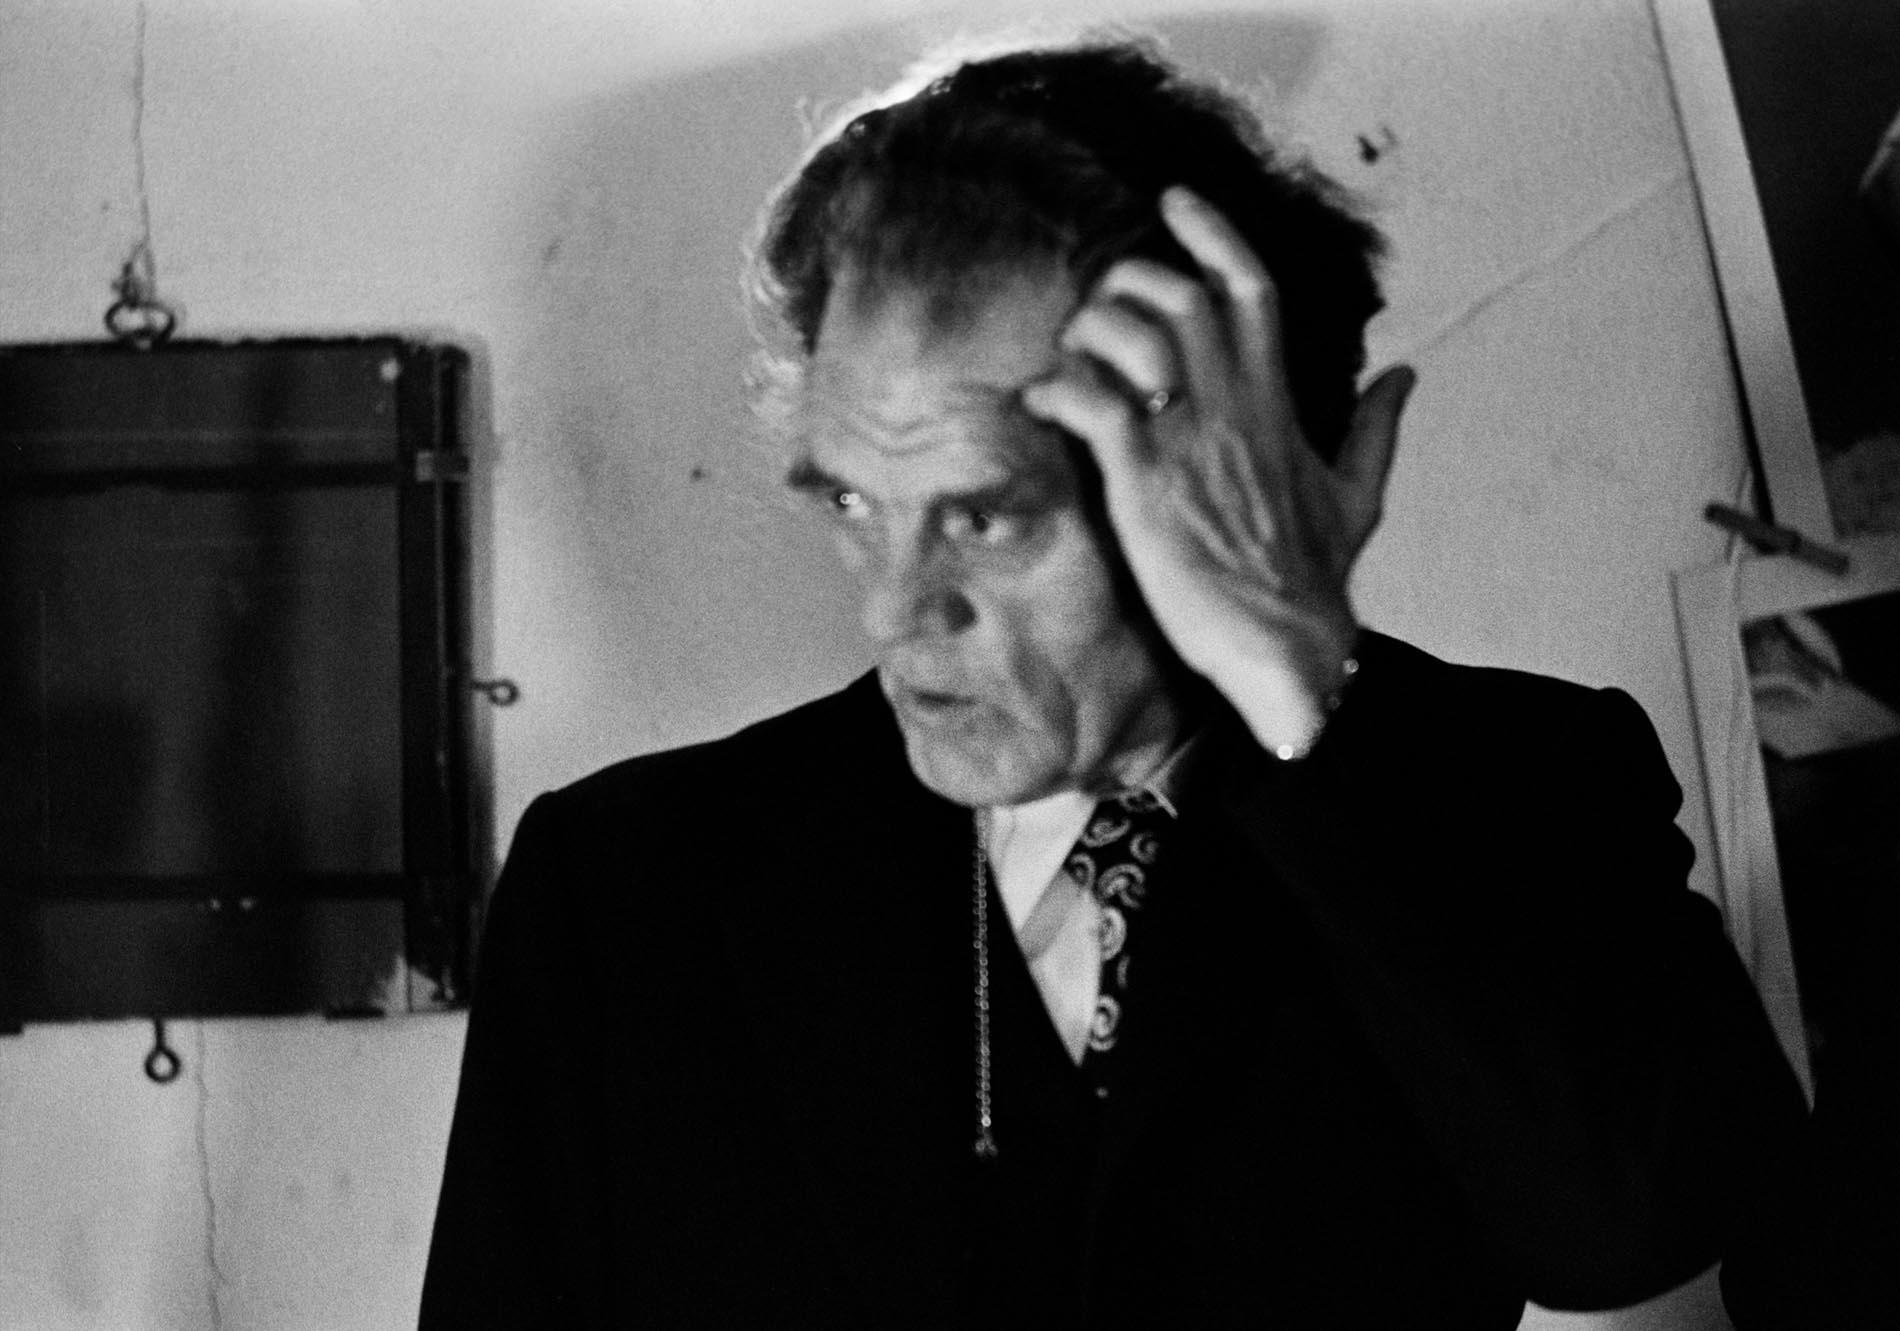 Luis Guerry, fotógrafo, 1990